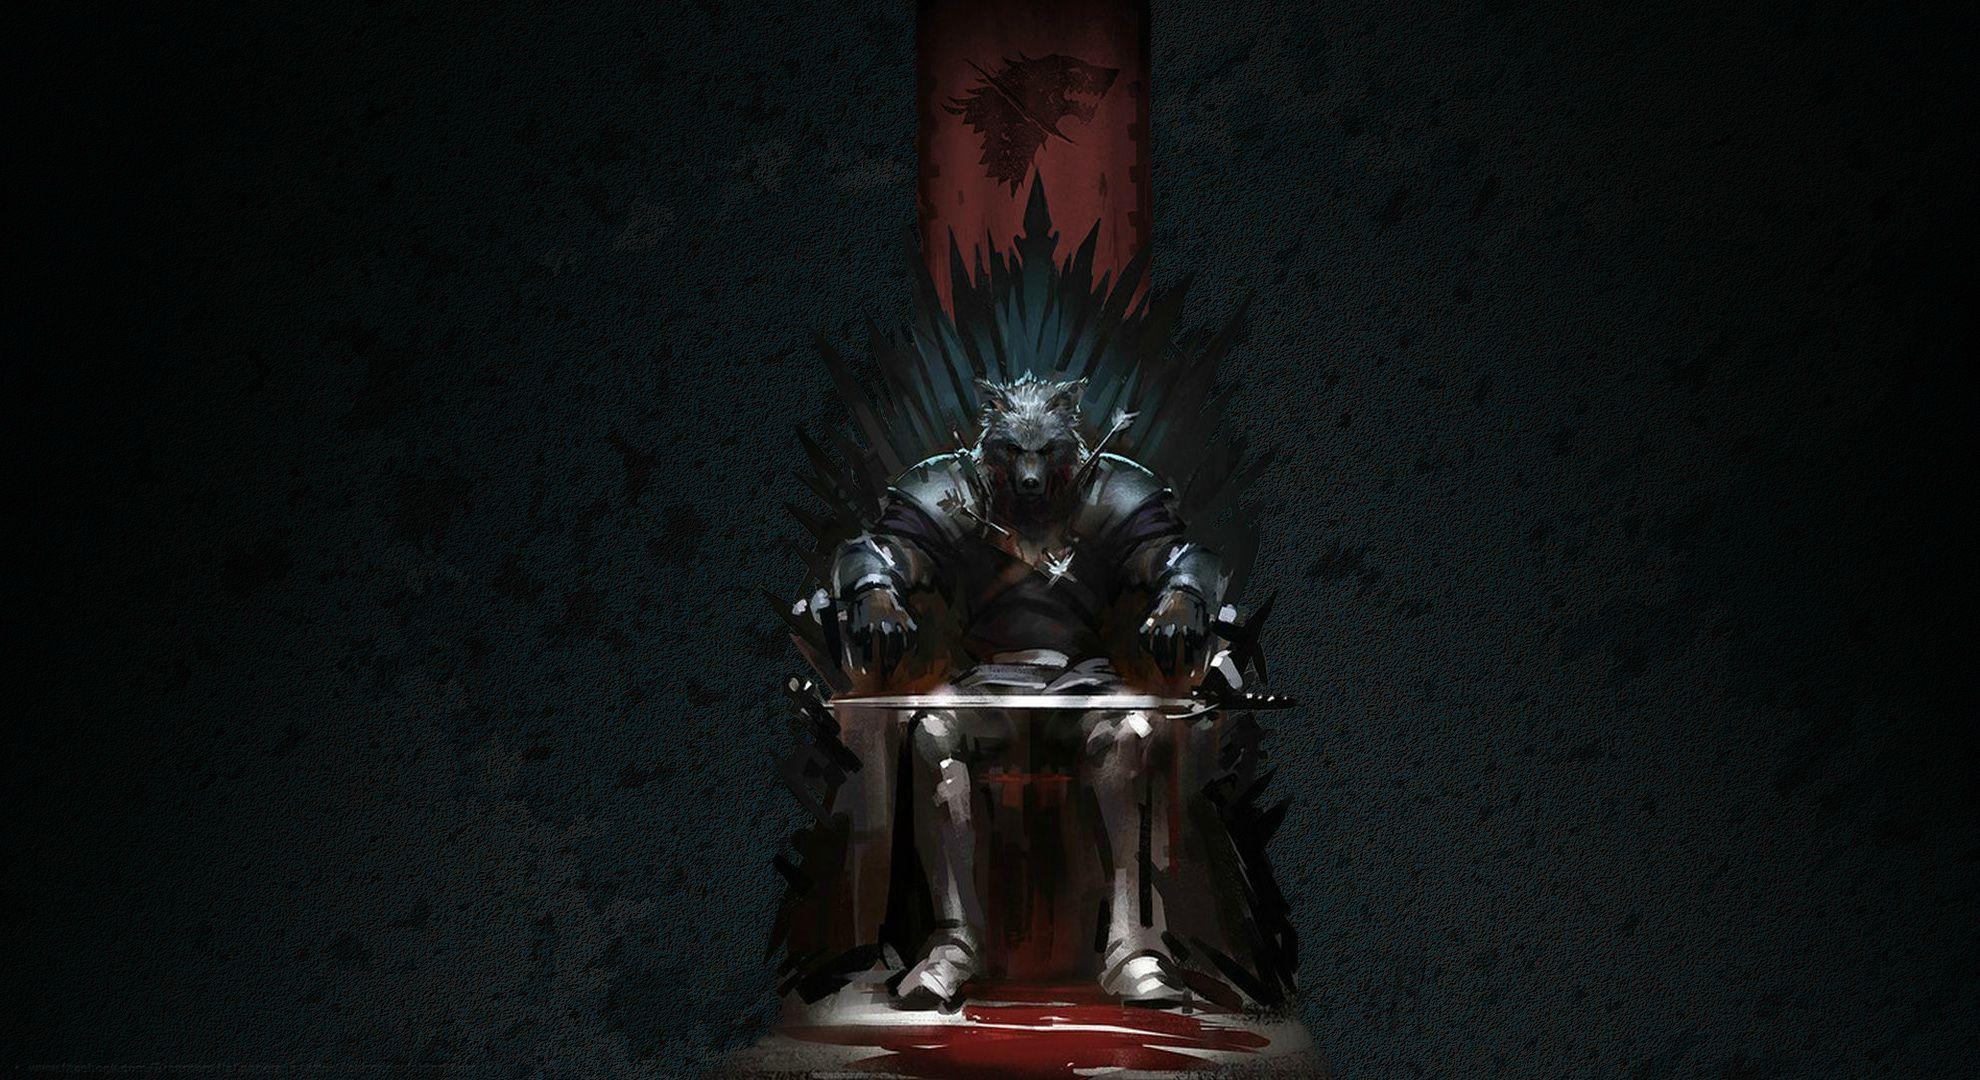 Robb Stark Wolf Head Hd Wallpaper Background Image 1980x1080